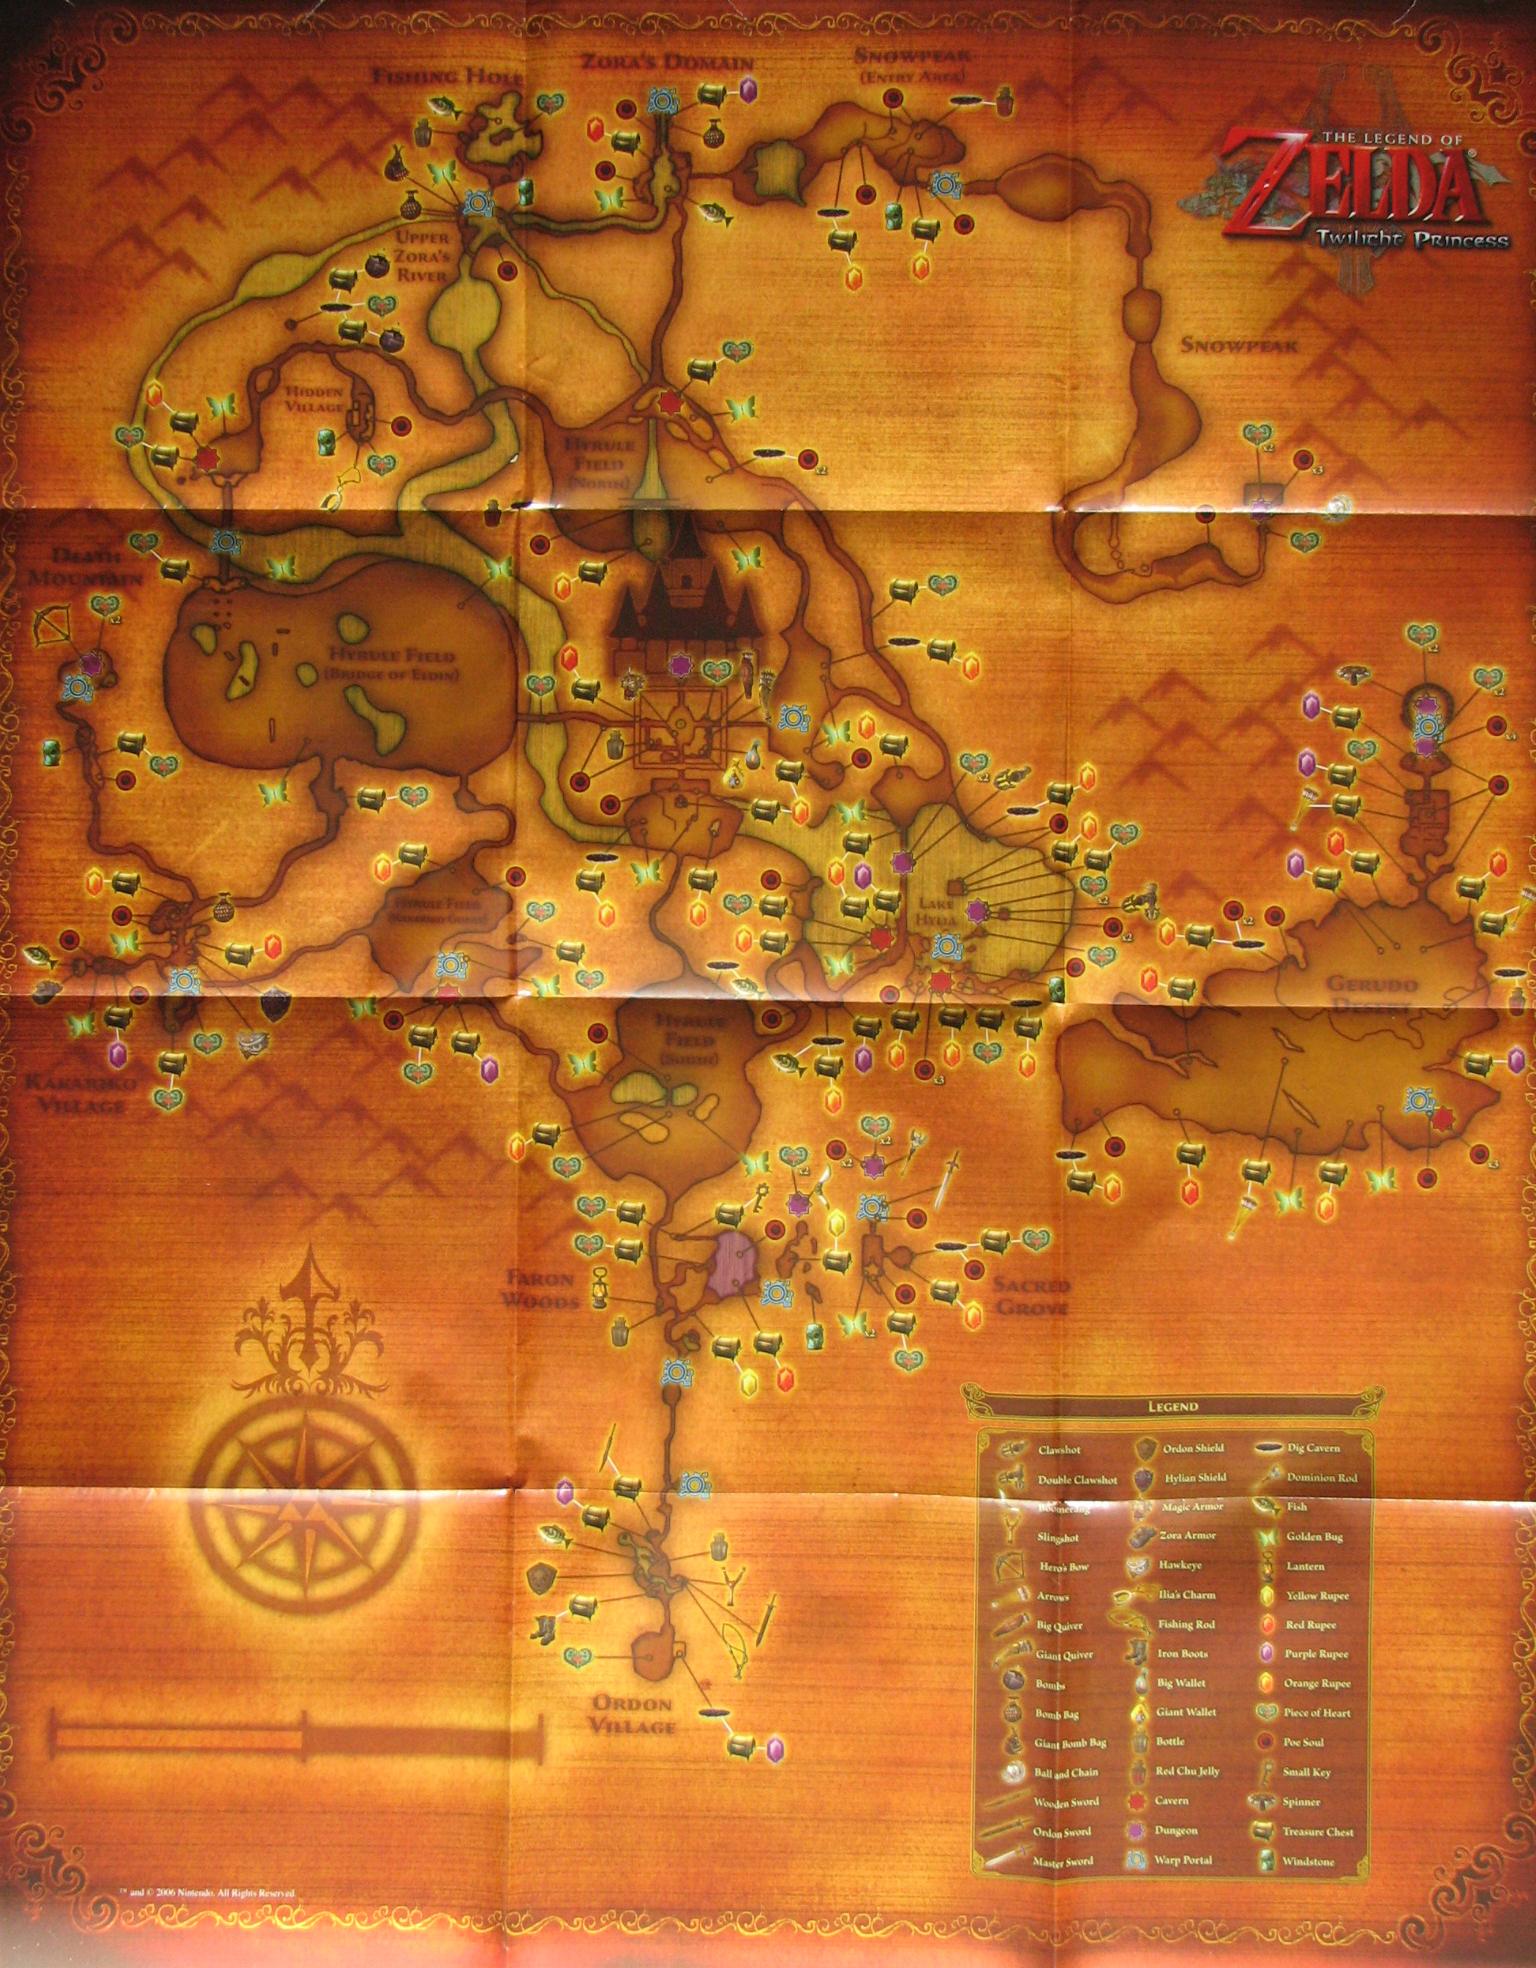 Twilight princess overworld map gumiabroncs Choice Image